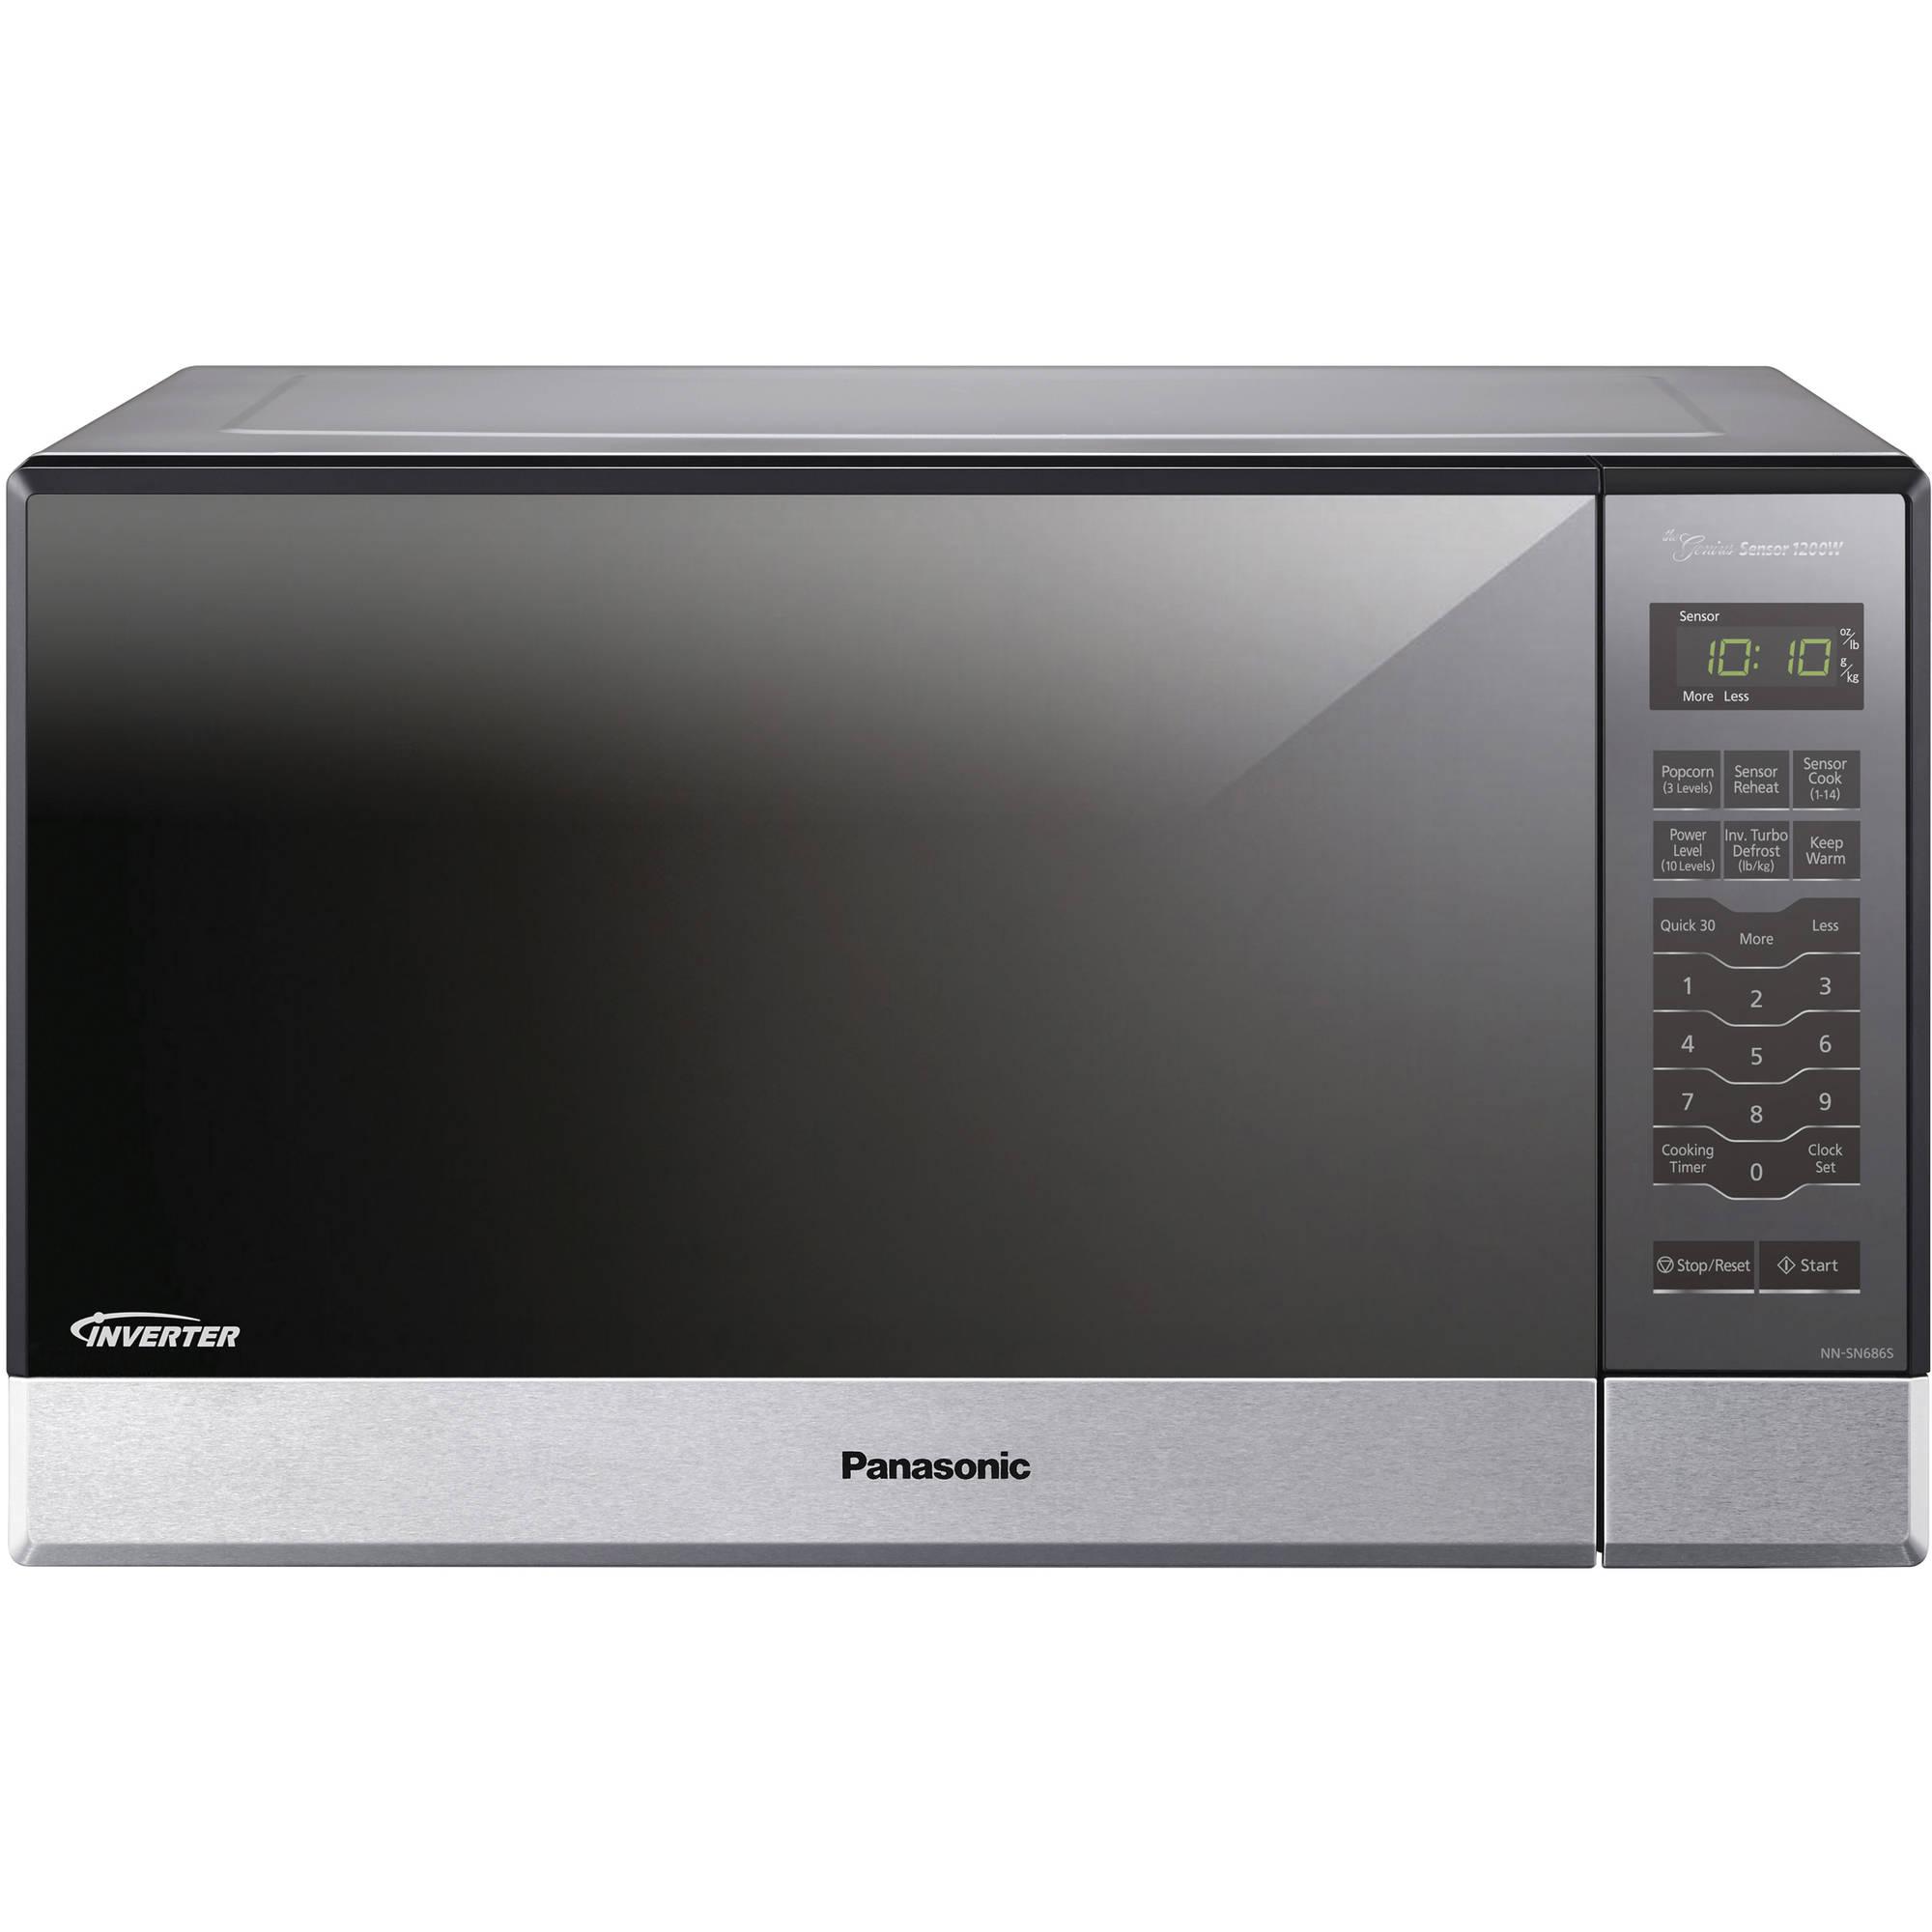 Panasonic 1 2 Cu Ft 1200w Countertop Microwave With